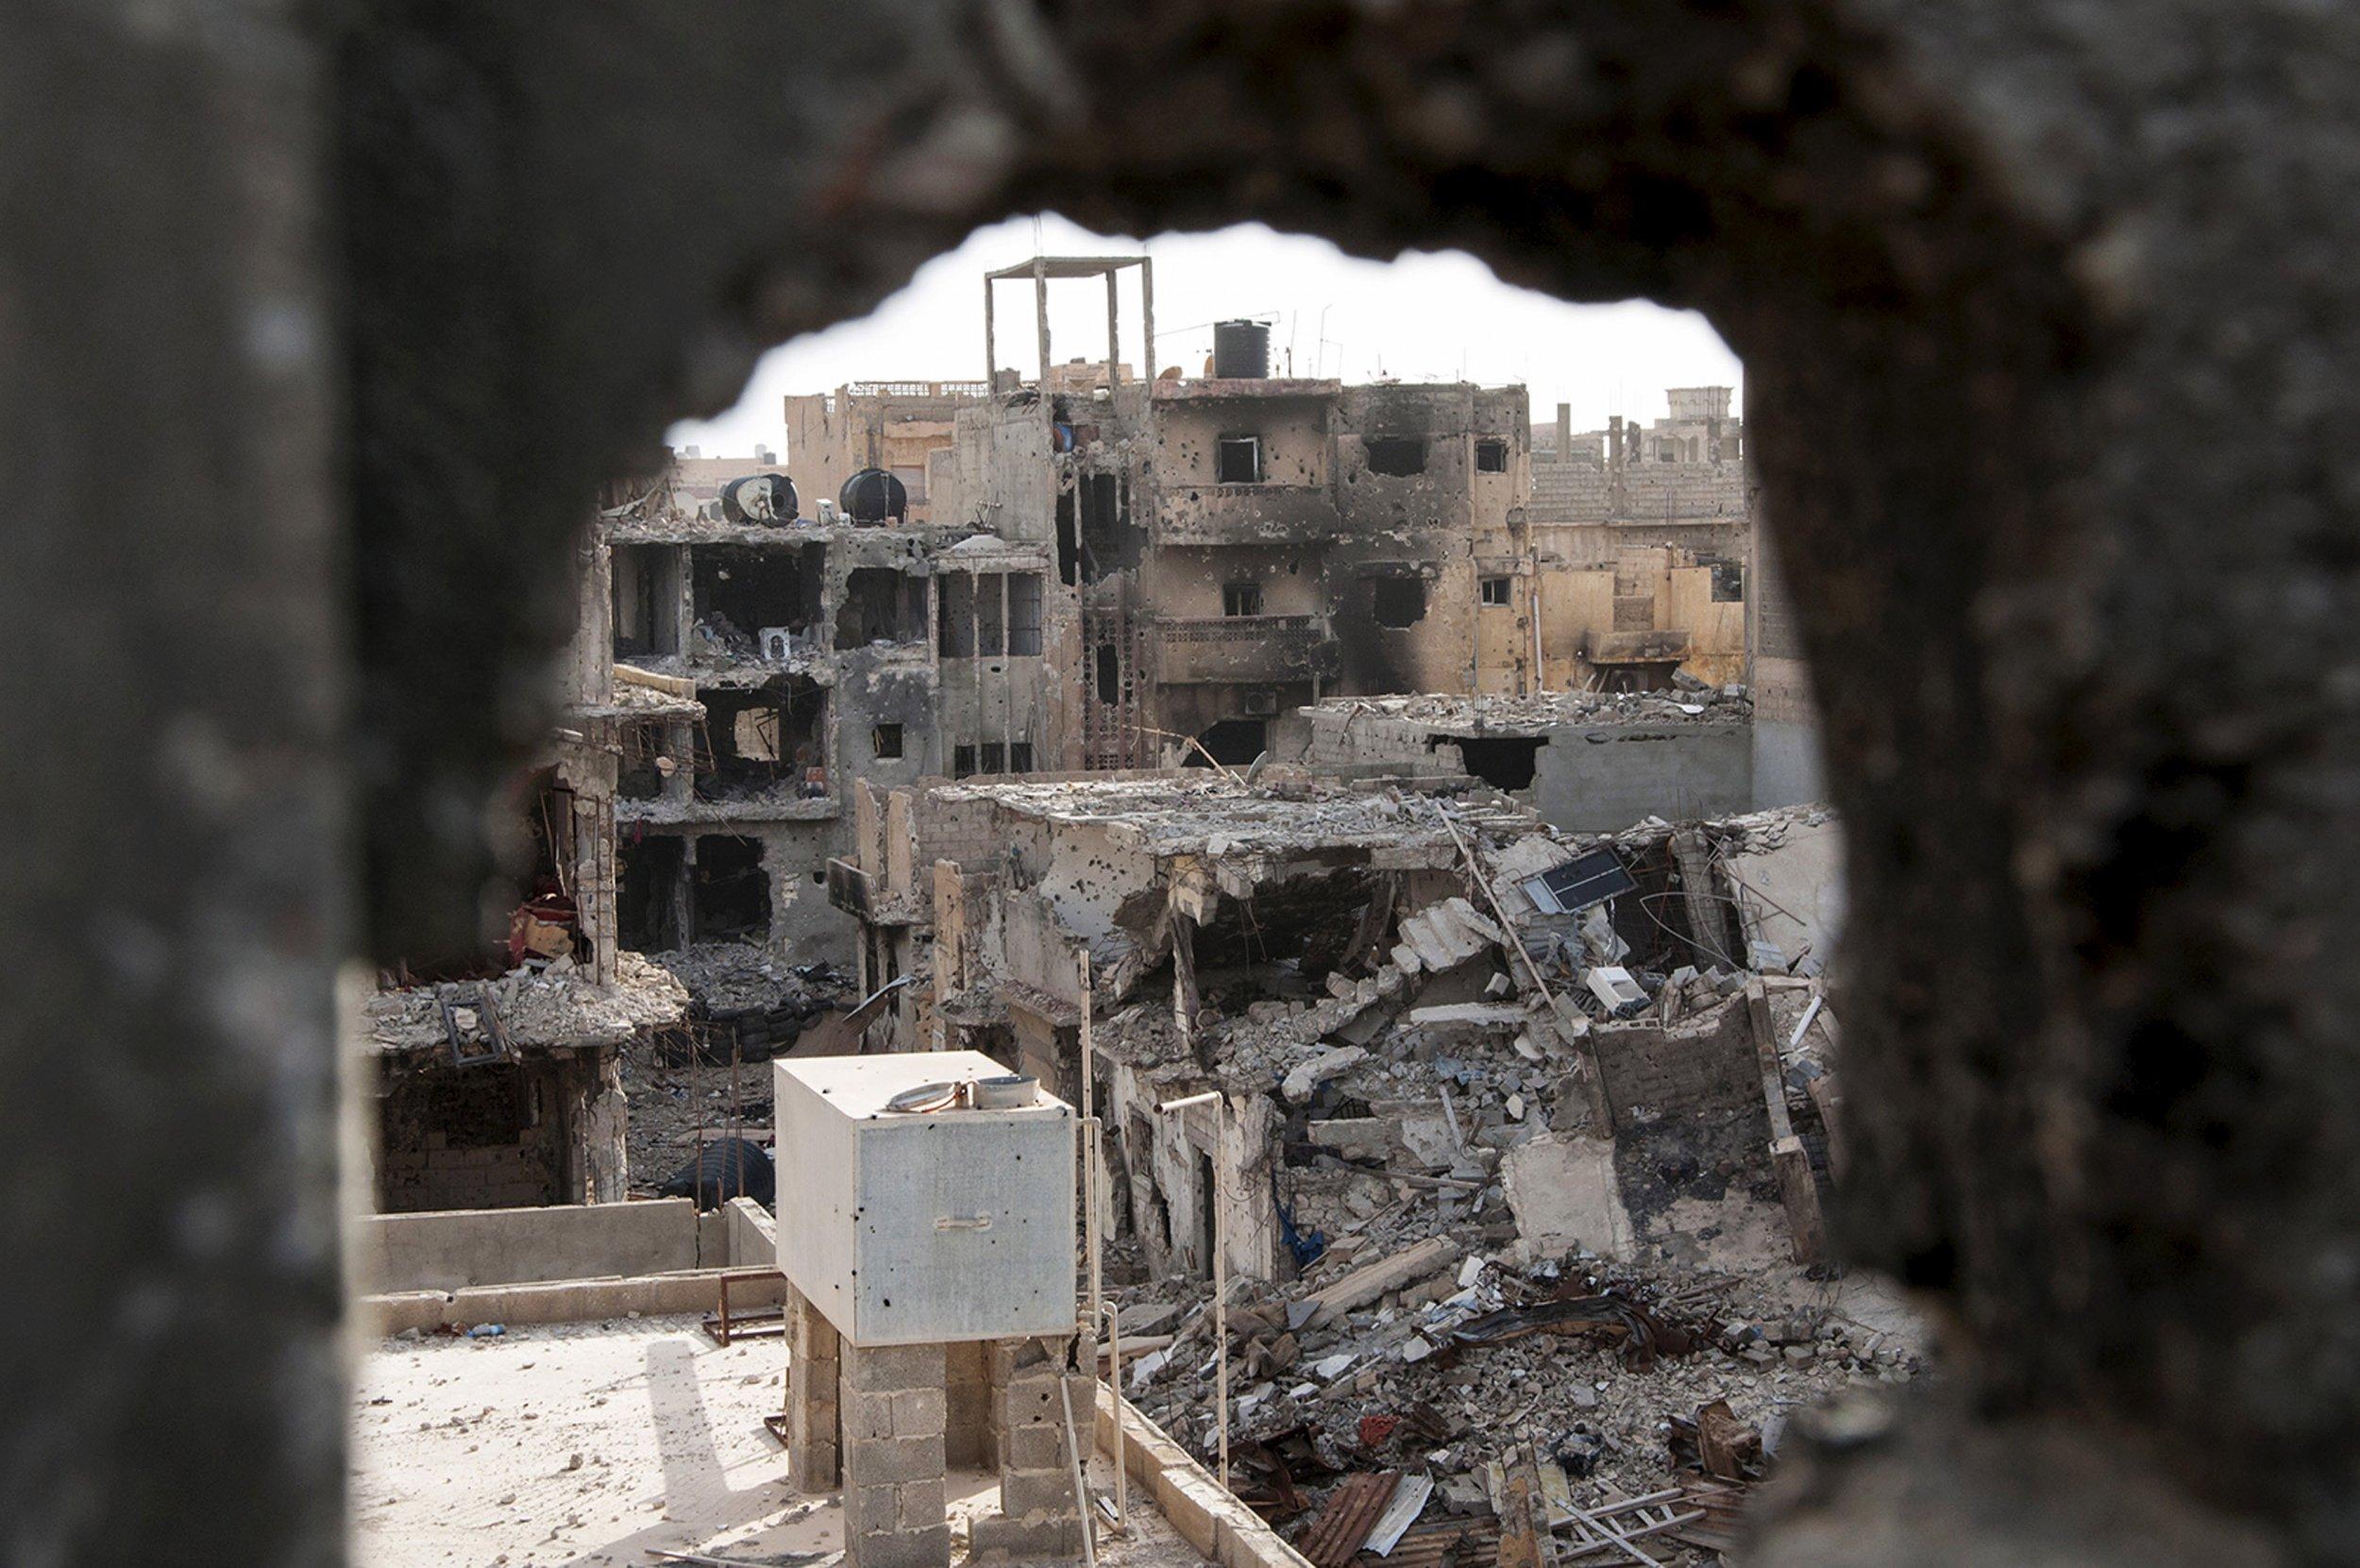 Benghazi buildings